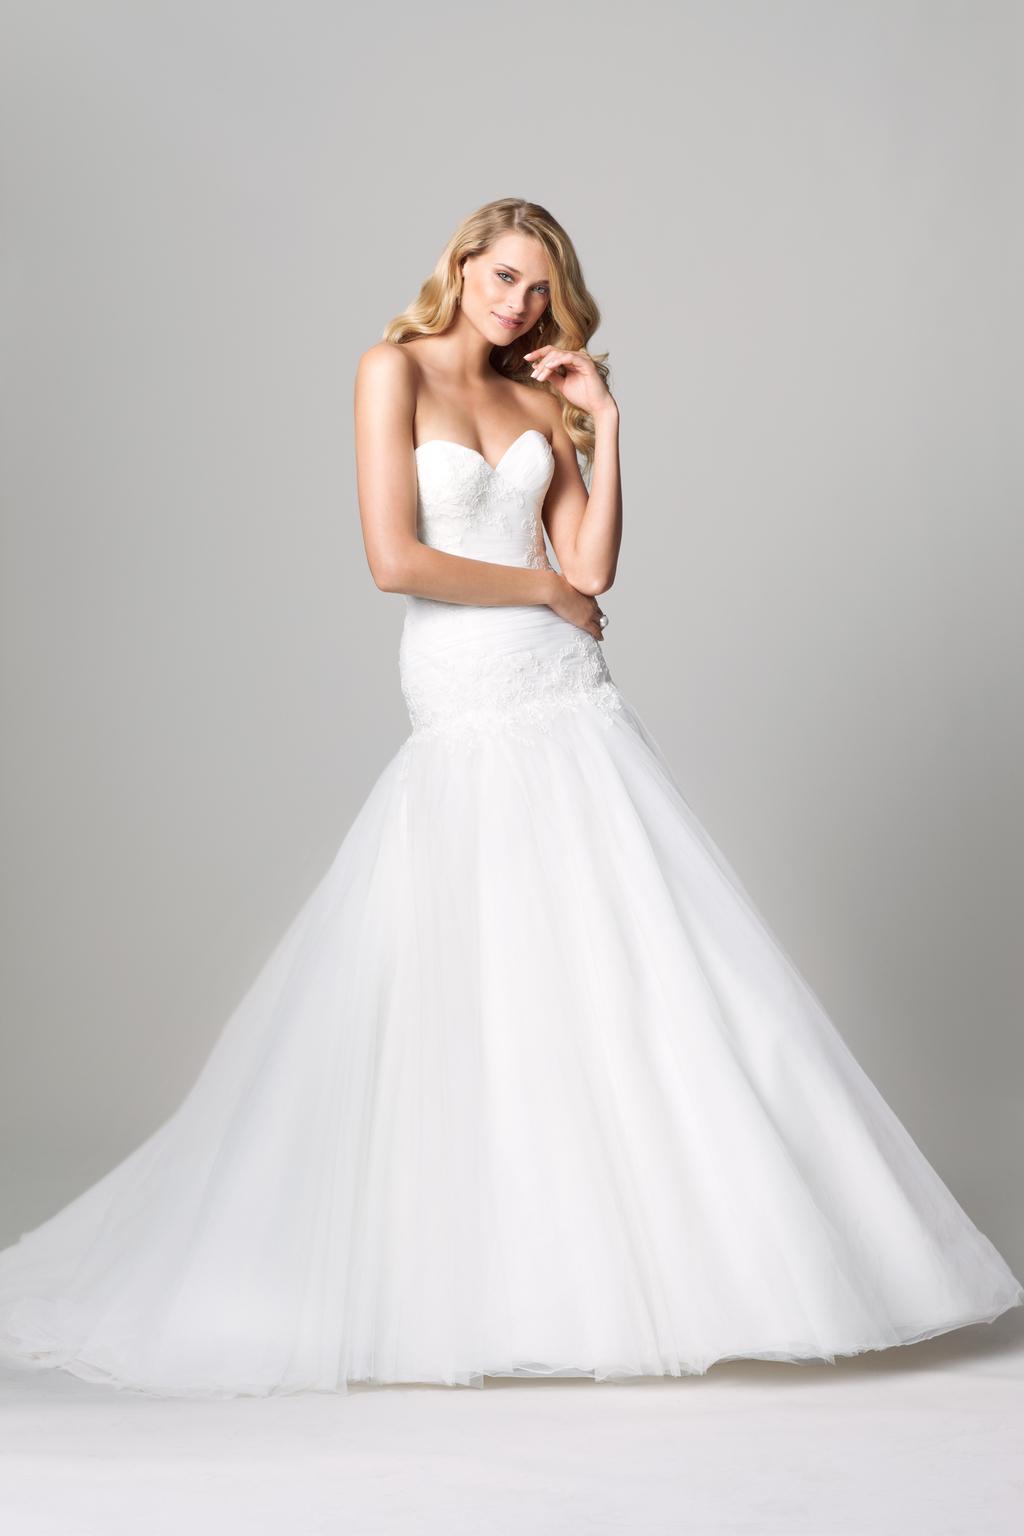 Fall-2012-wedding-dress-wtoo-bridal-gown-by-watters-11b.full